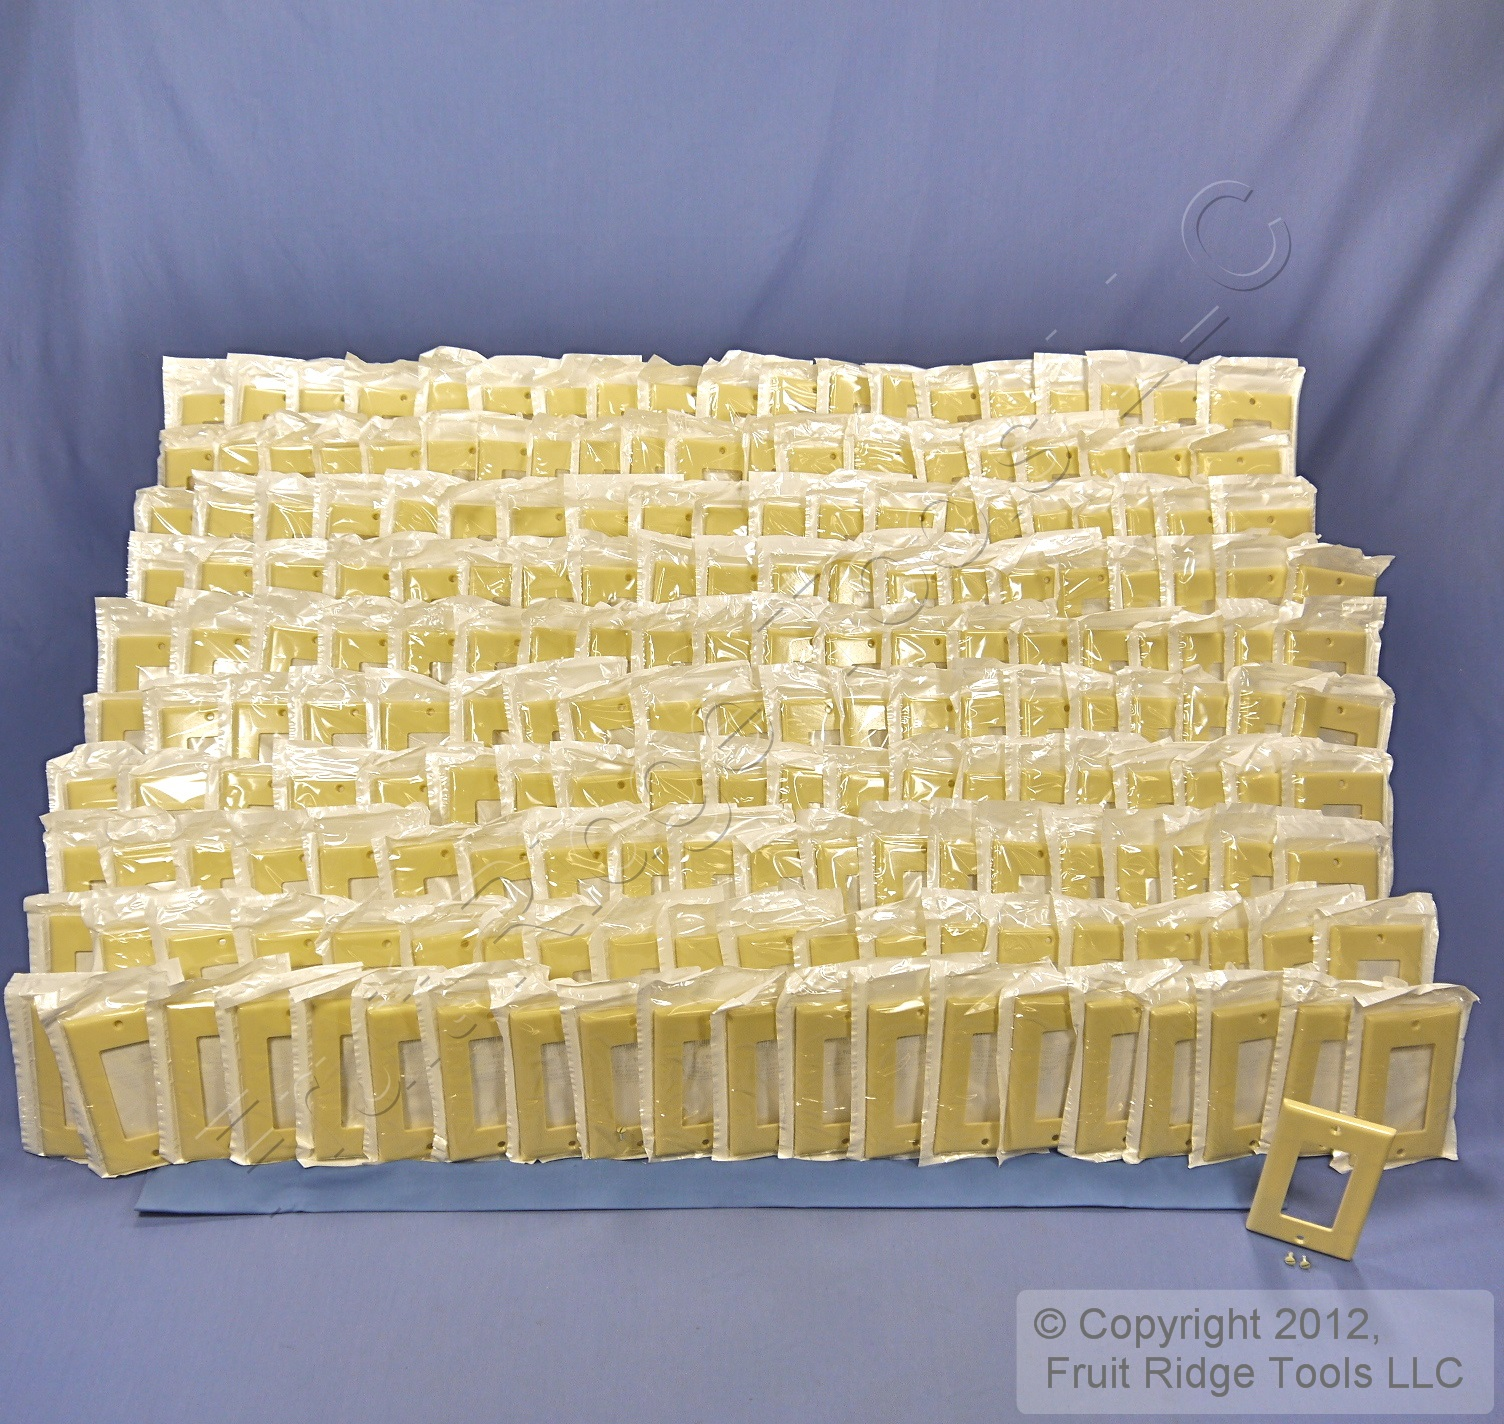 150 Leviton Almond Decora GFI GFCI Cover Flush 1-Gang Plastic Wallplates 80401-A